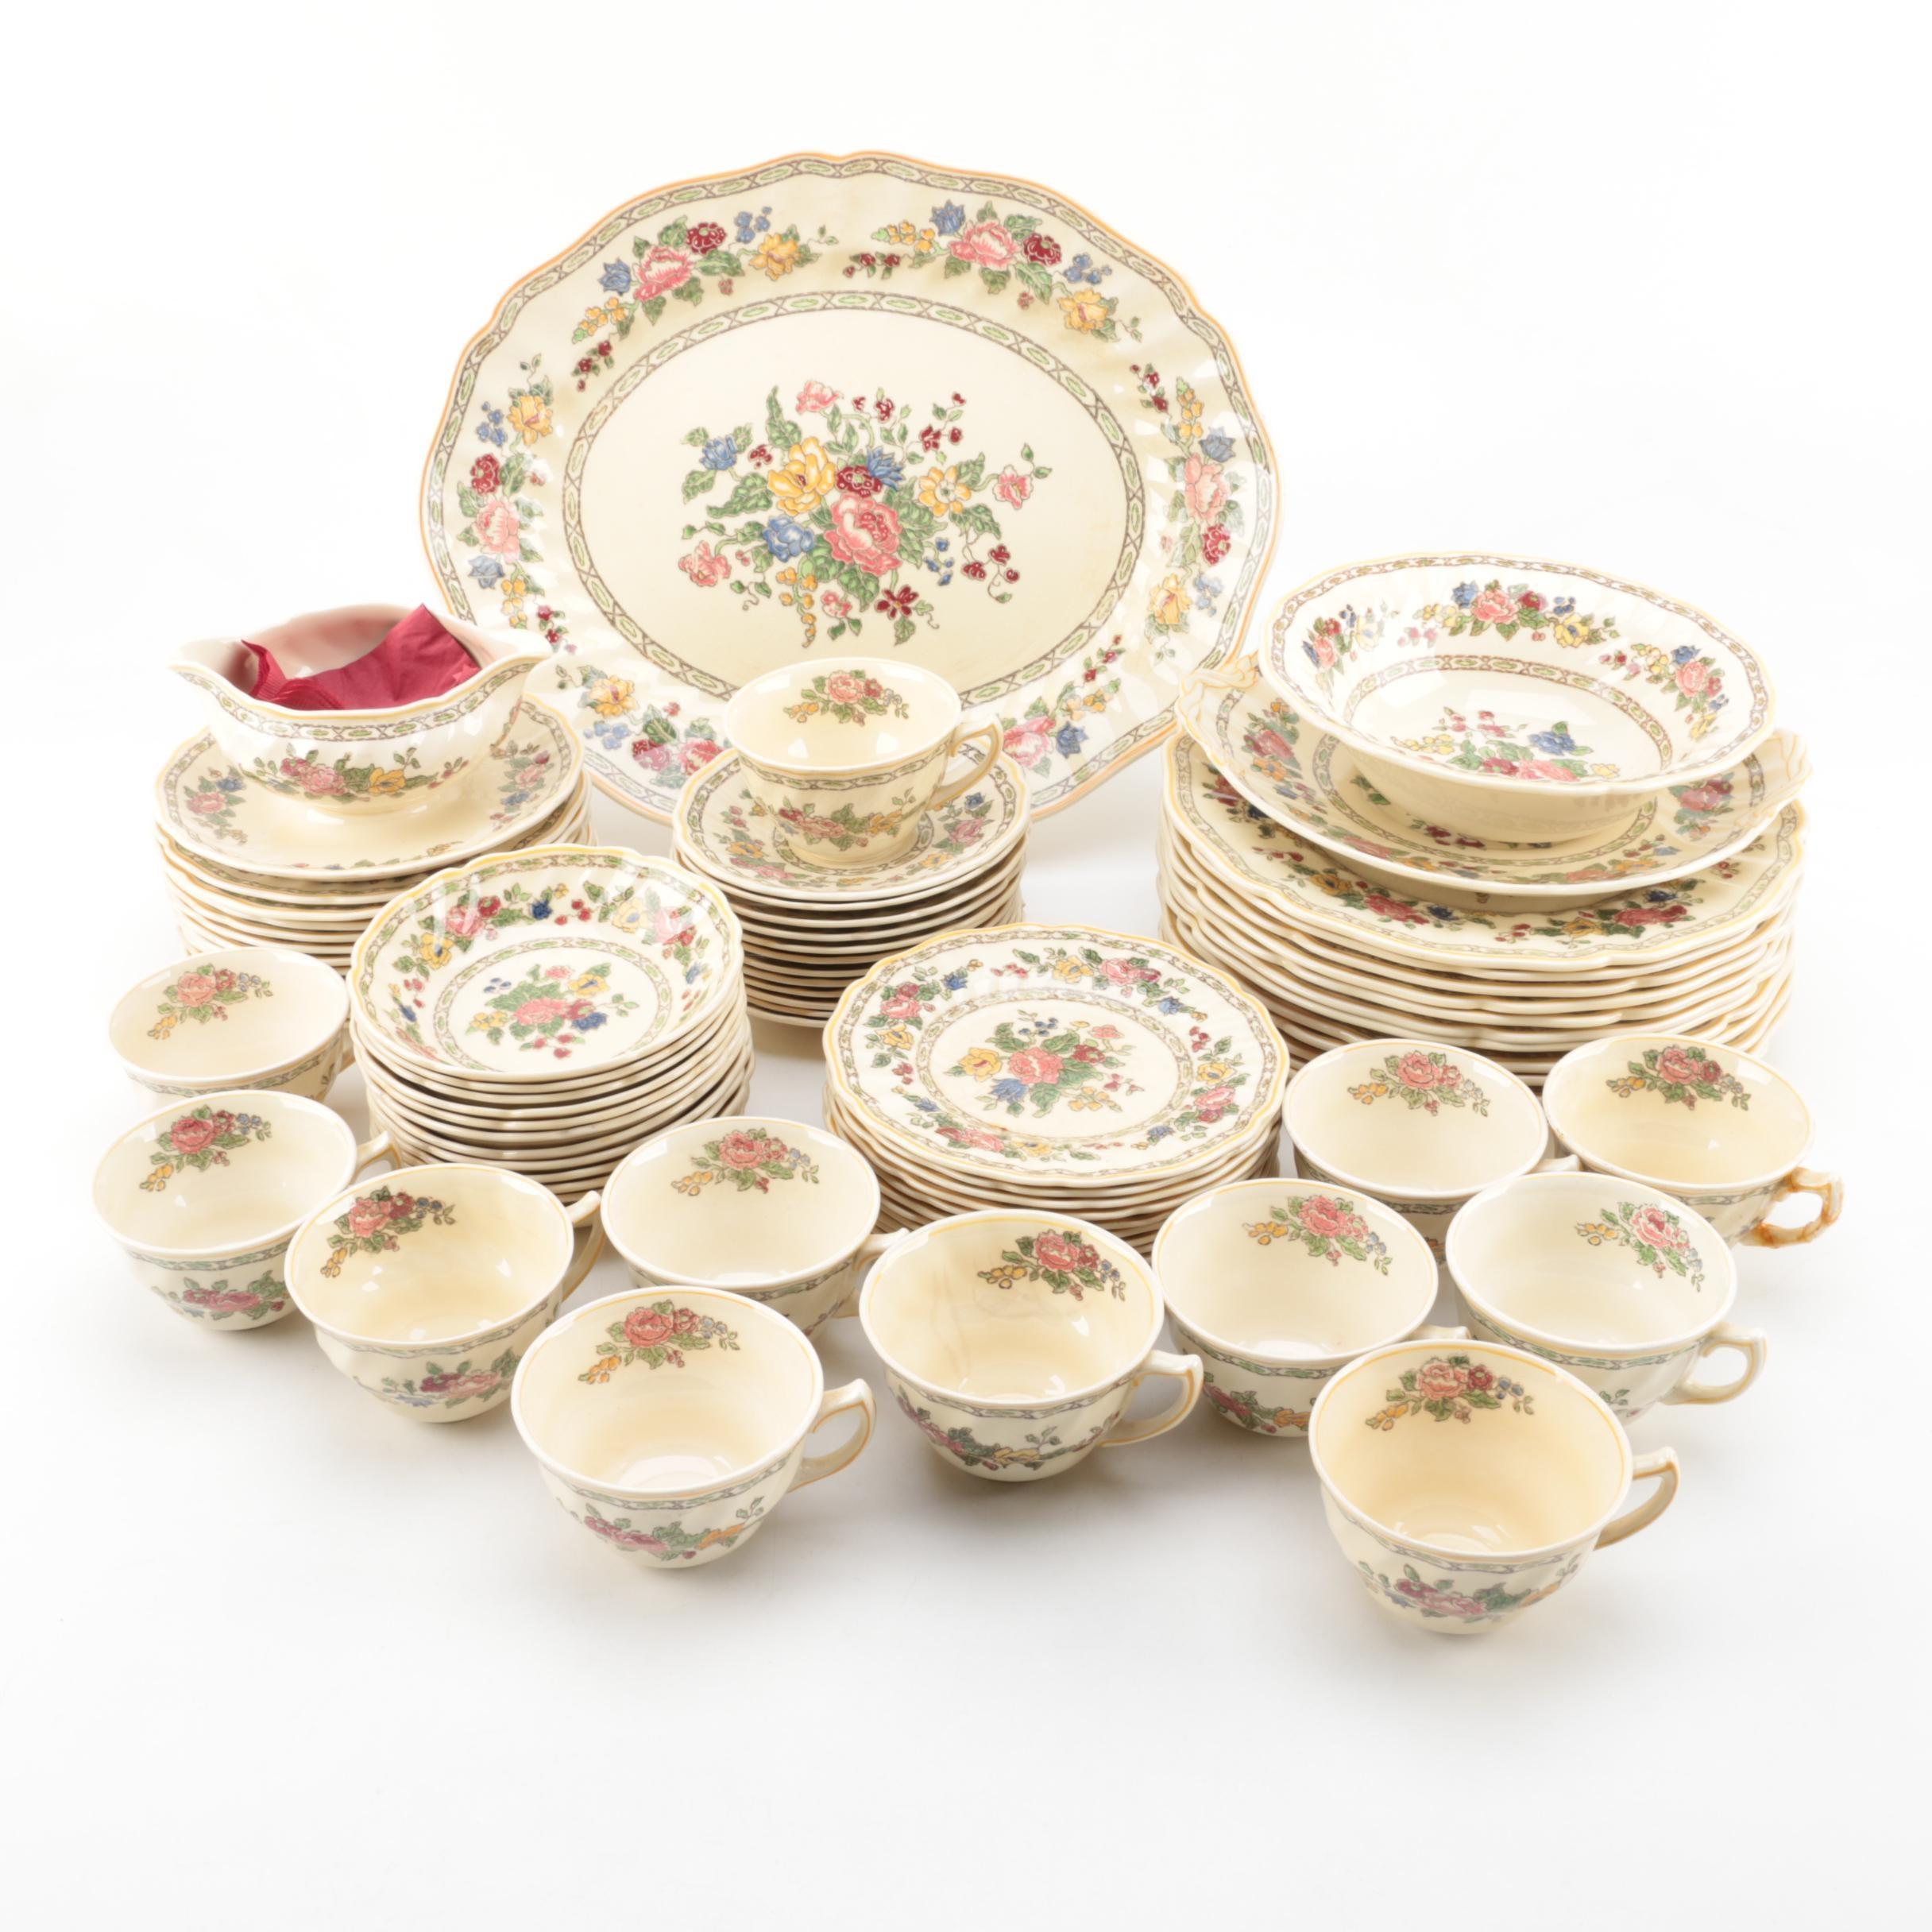 "Vintage Royal Doulton ""The Cavendish"" Porcelain Tableware"